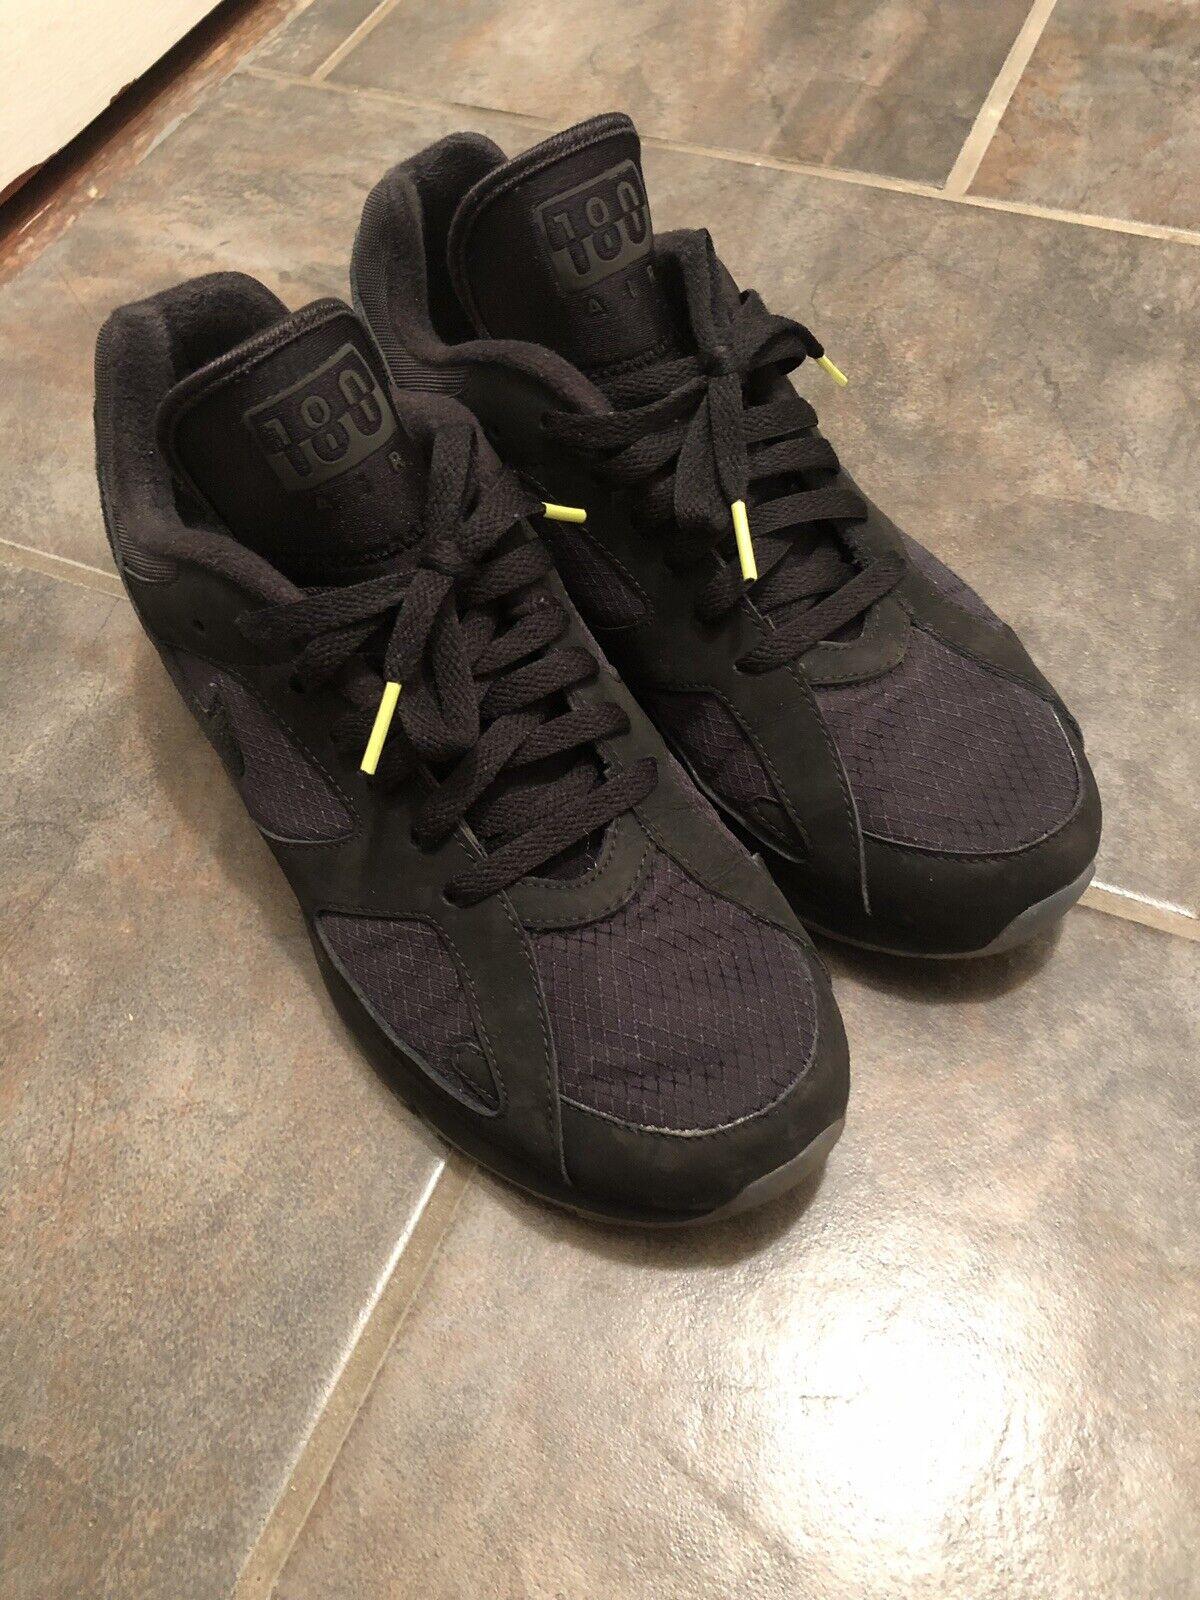 Nike Air Max 180 Night Ops - Black   Volt - US MENS 8.5